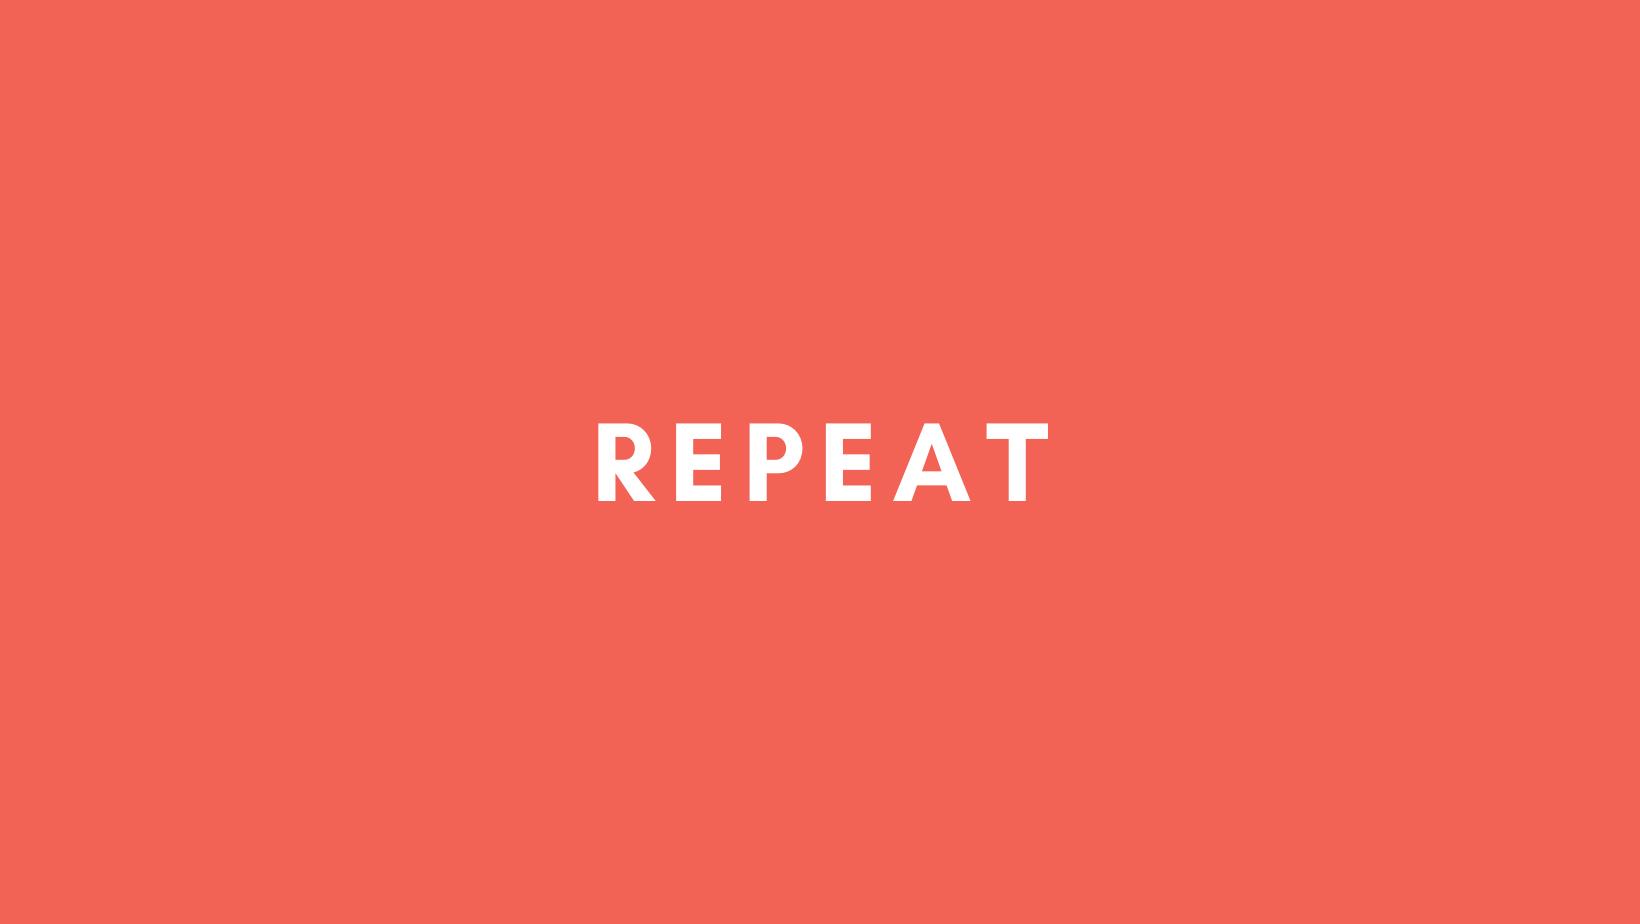 Repeat